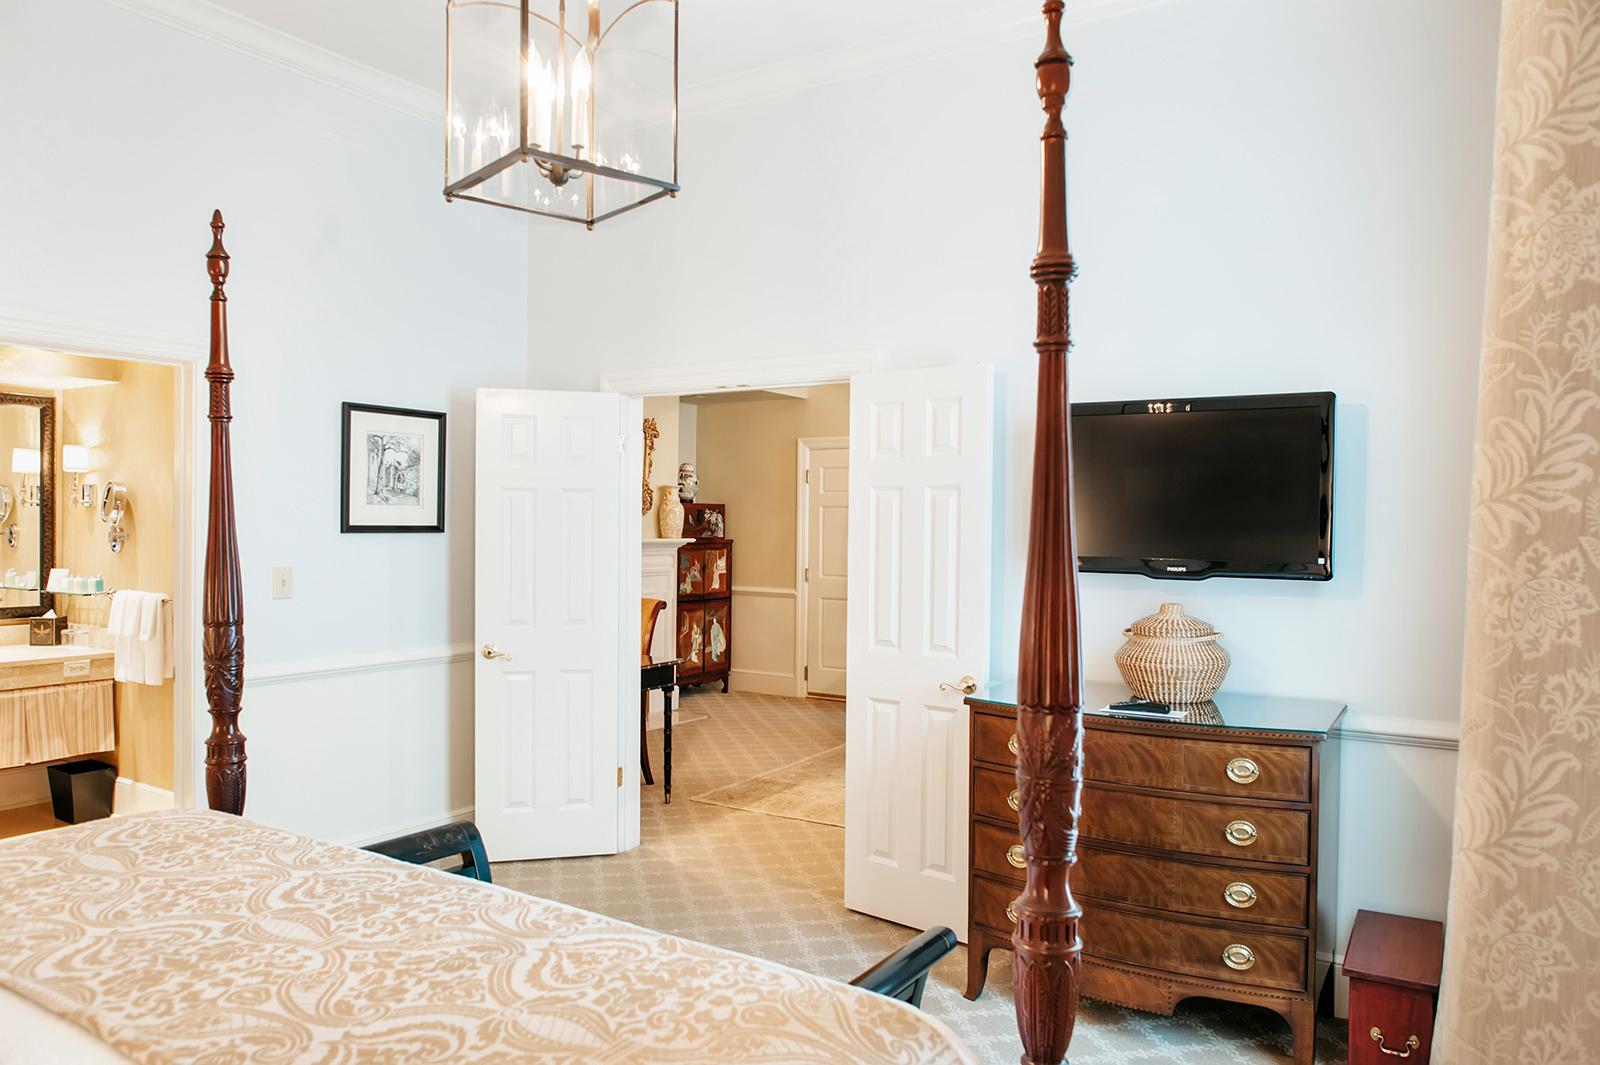 2 Bedroom Hotels In Charleston Sc 28 Images Stunning 2 Bedroom Suites Charleston Sc Images